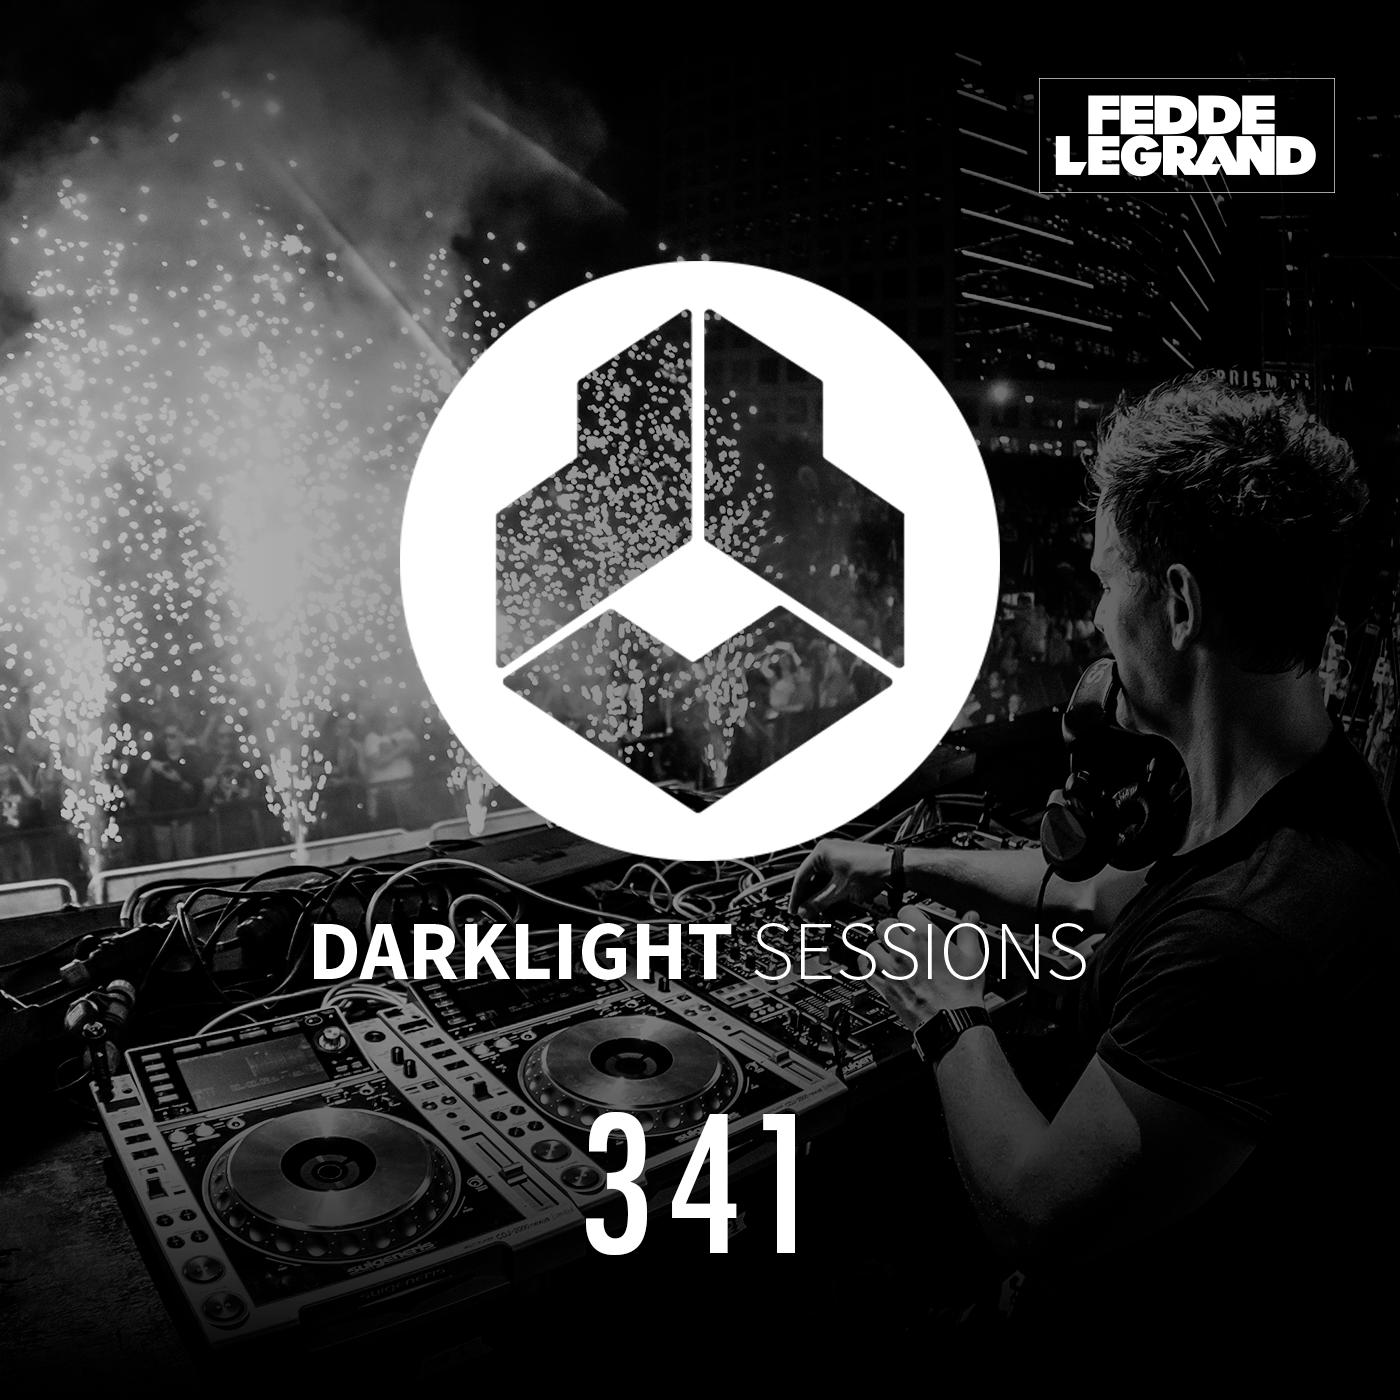 Darklight Sessions 341